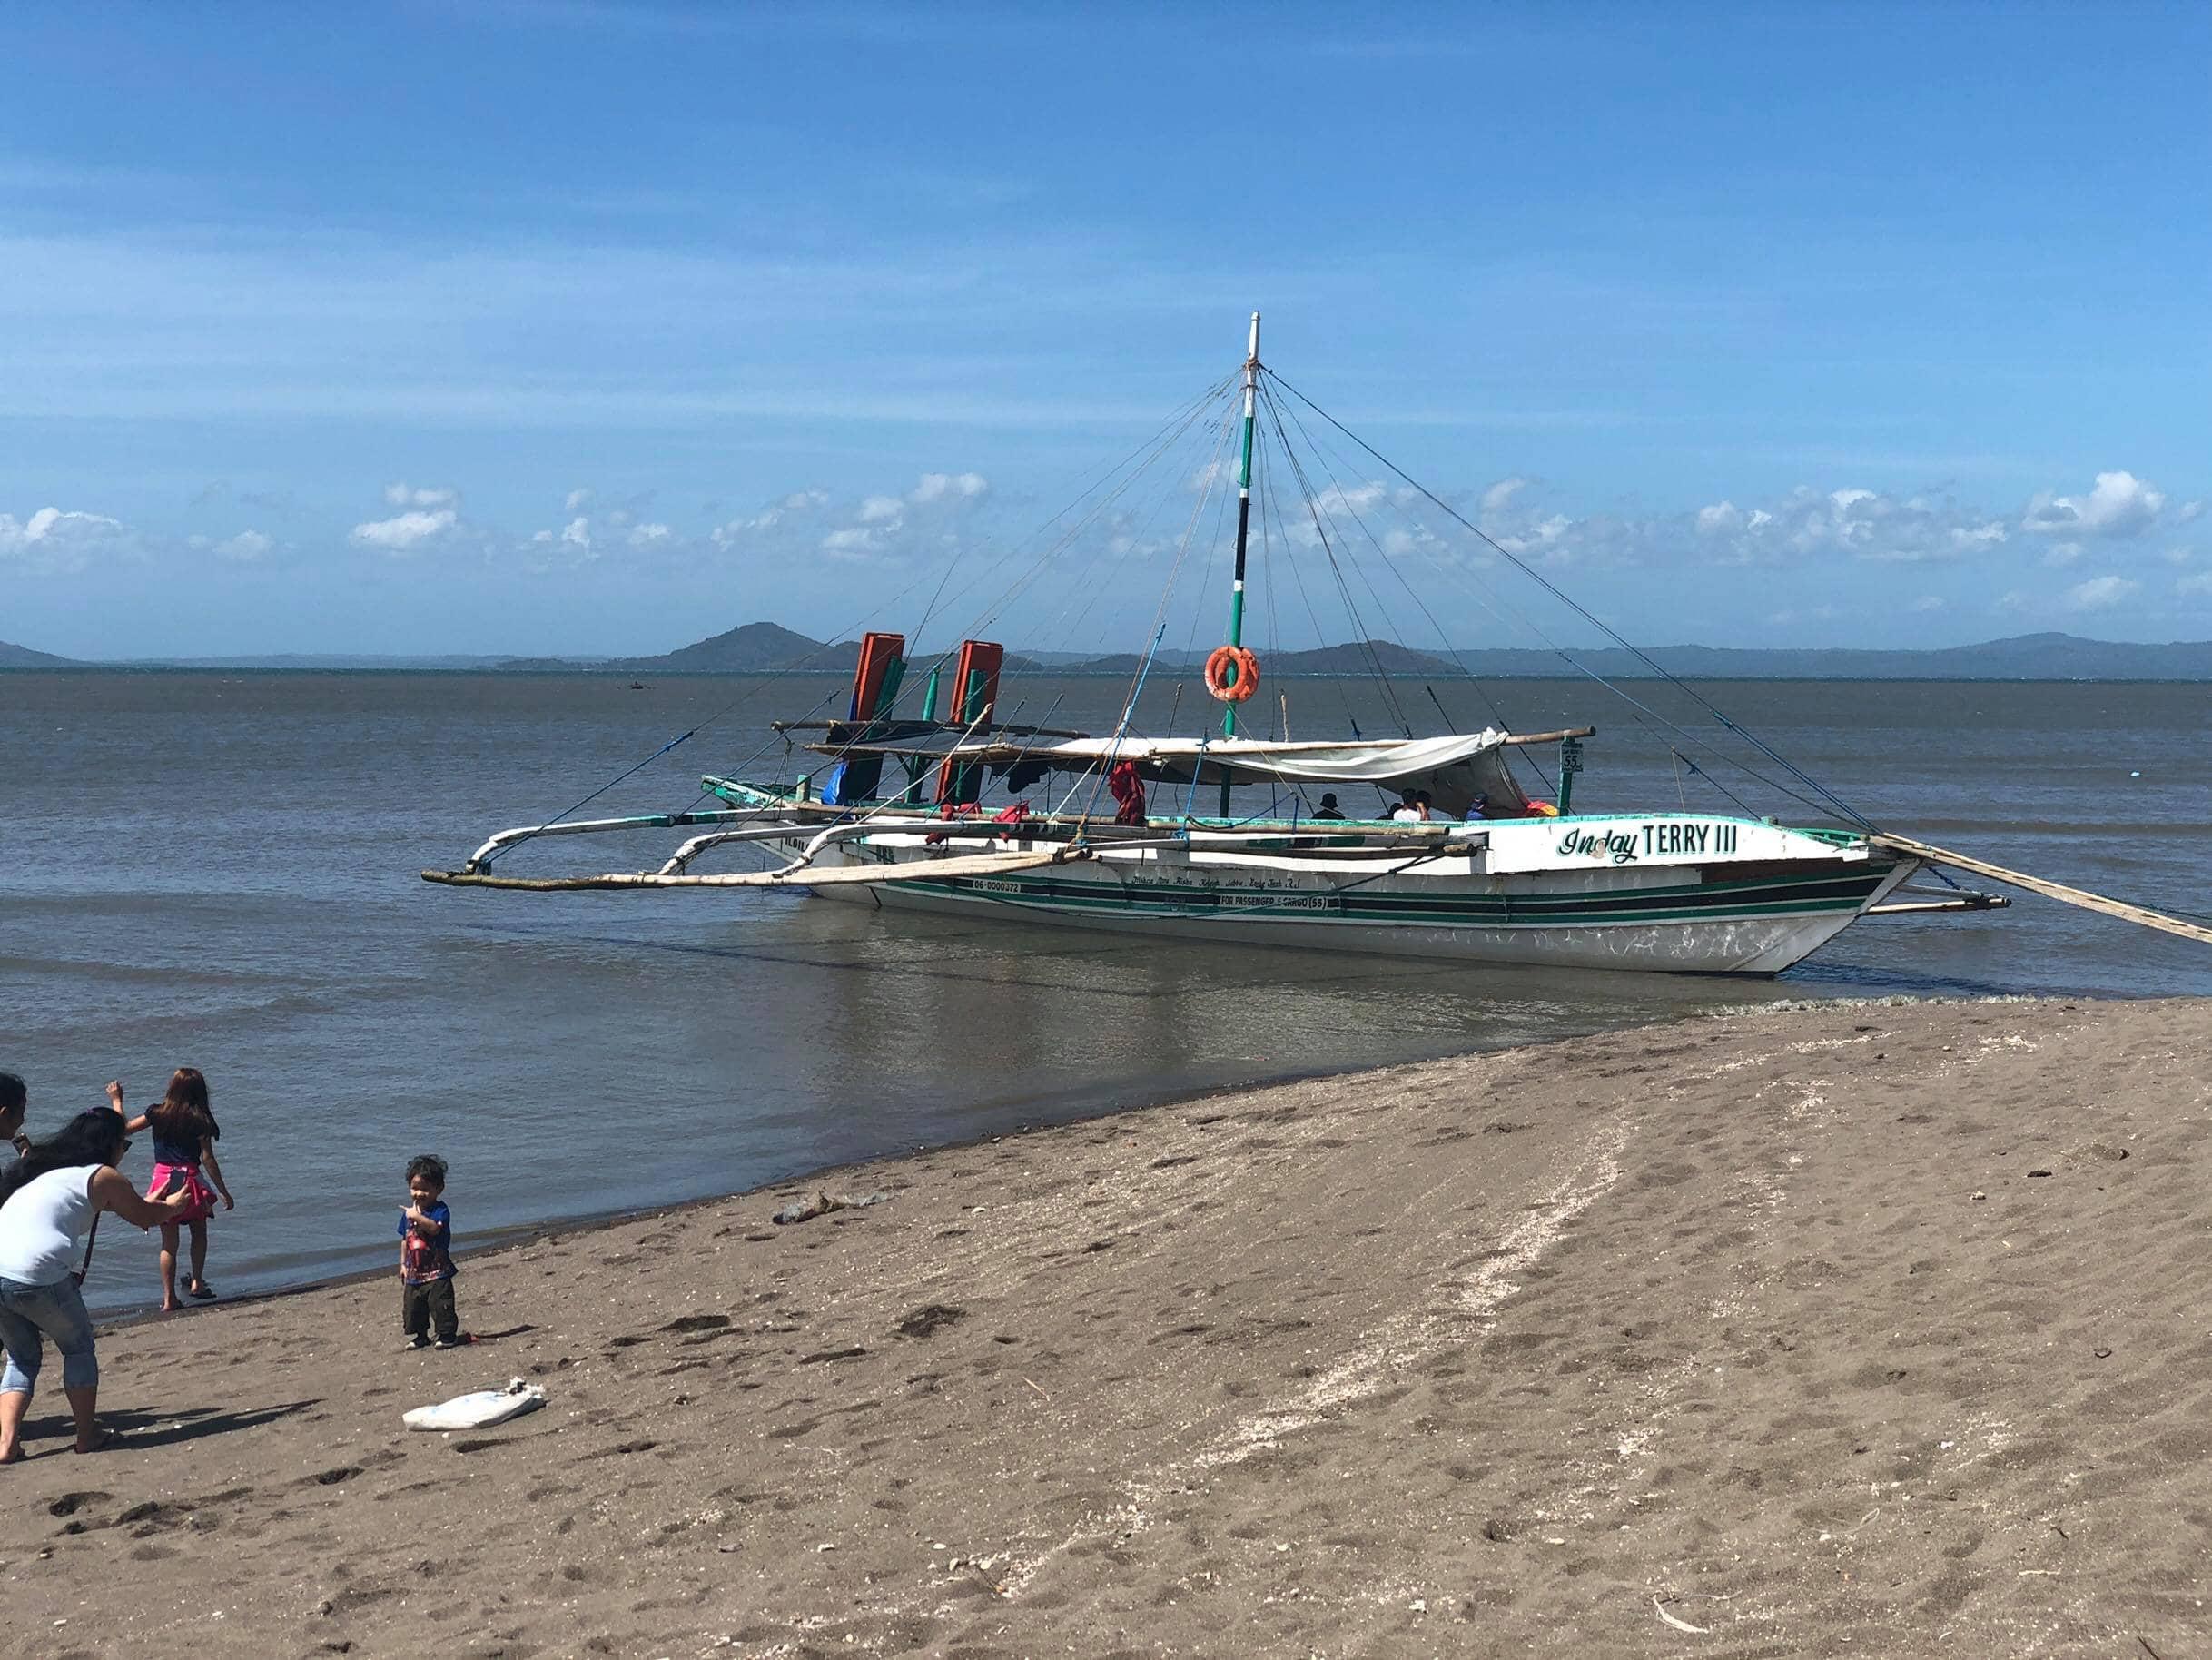 Guimaras tourist spots, Guimaras Island travel guide, where to go in Guimaras Island, Guimaras Island